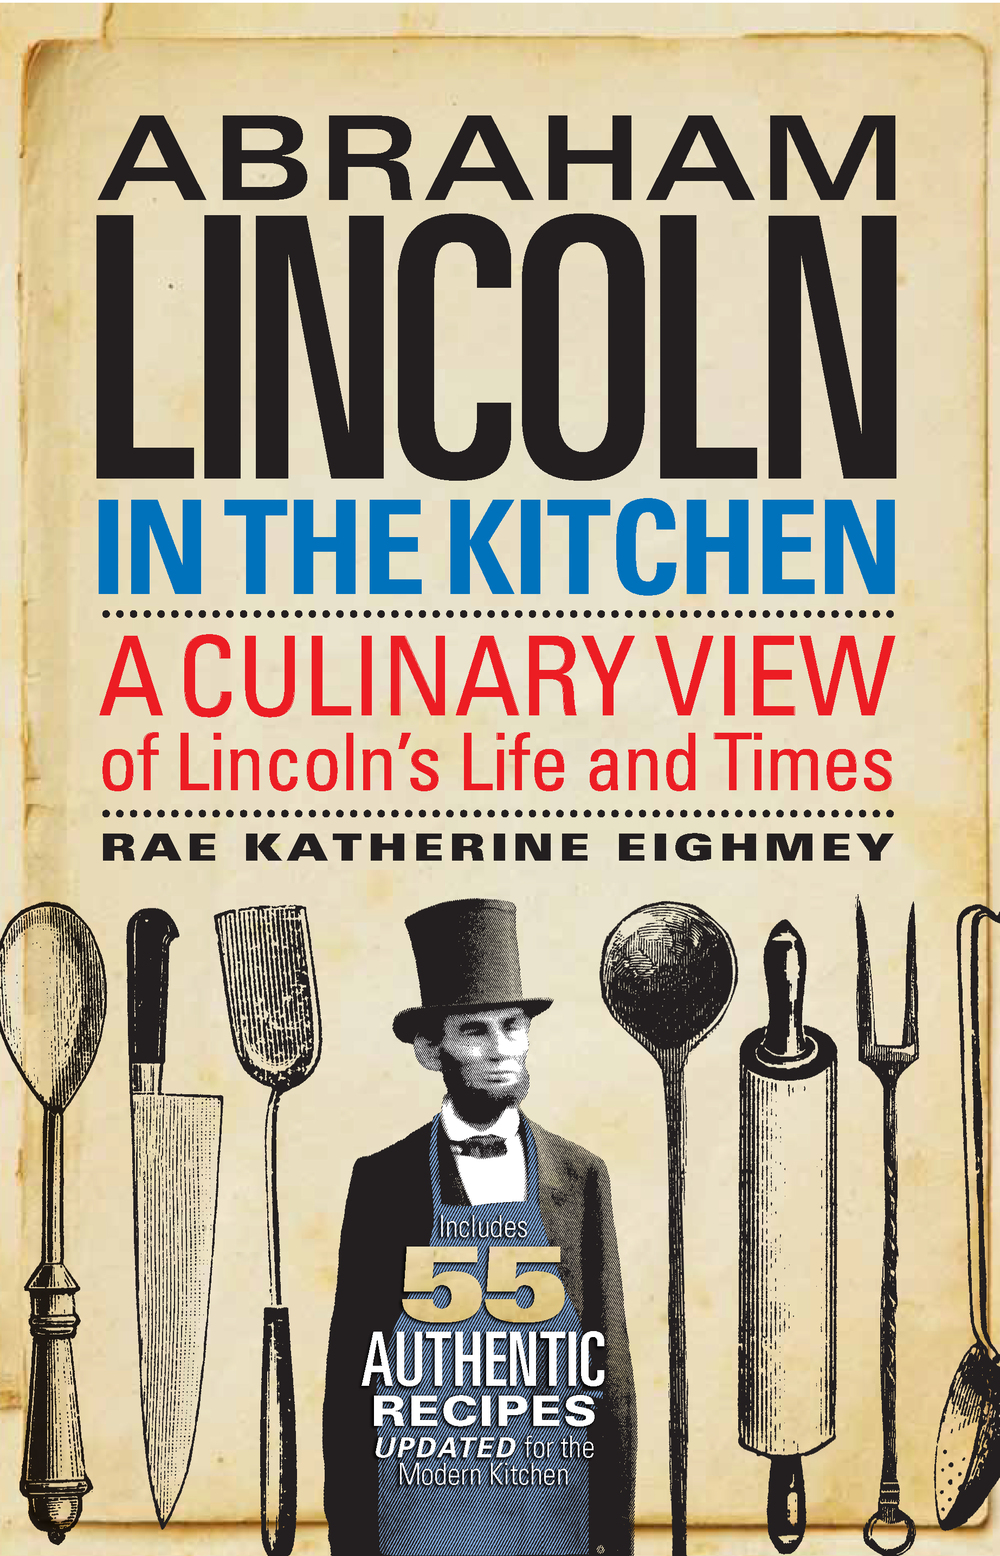 Abraham Lincoln In The Kitchen.jpg